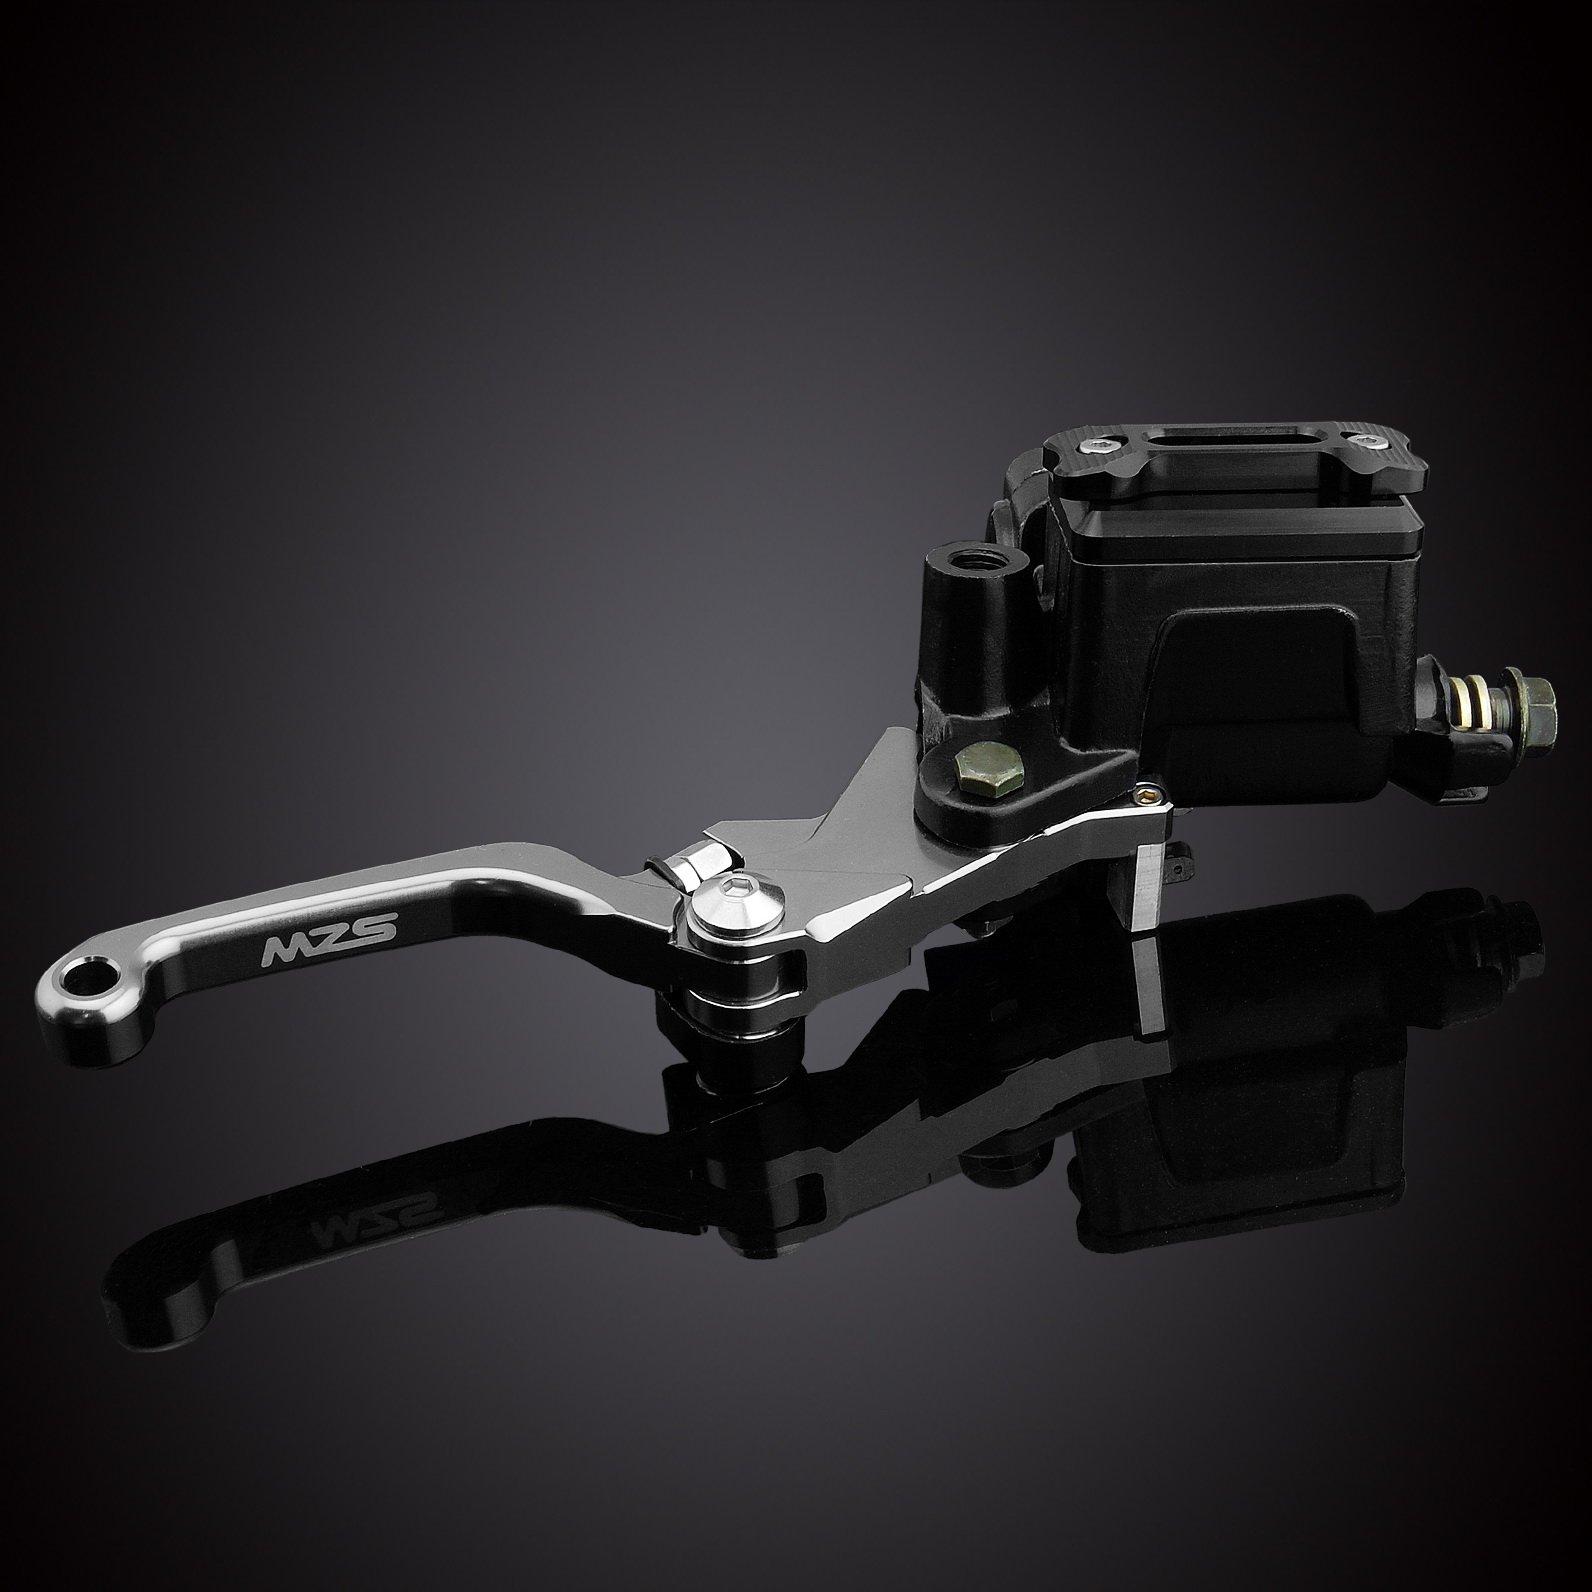 MZS 7/8 Brake Master Cylinder Reservoir Pivot Levers Set for Honda Yamaha Suzuki Kawasaki KTM (Gray) by MZS (Image #3)